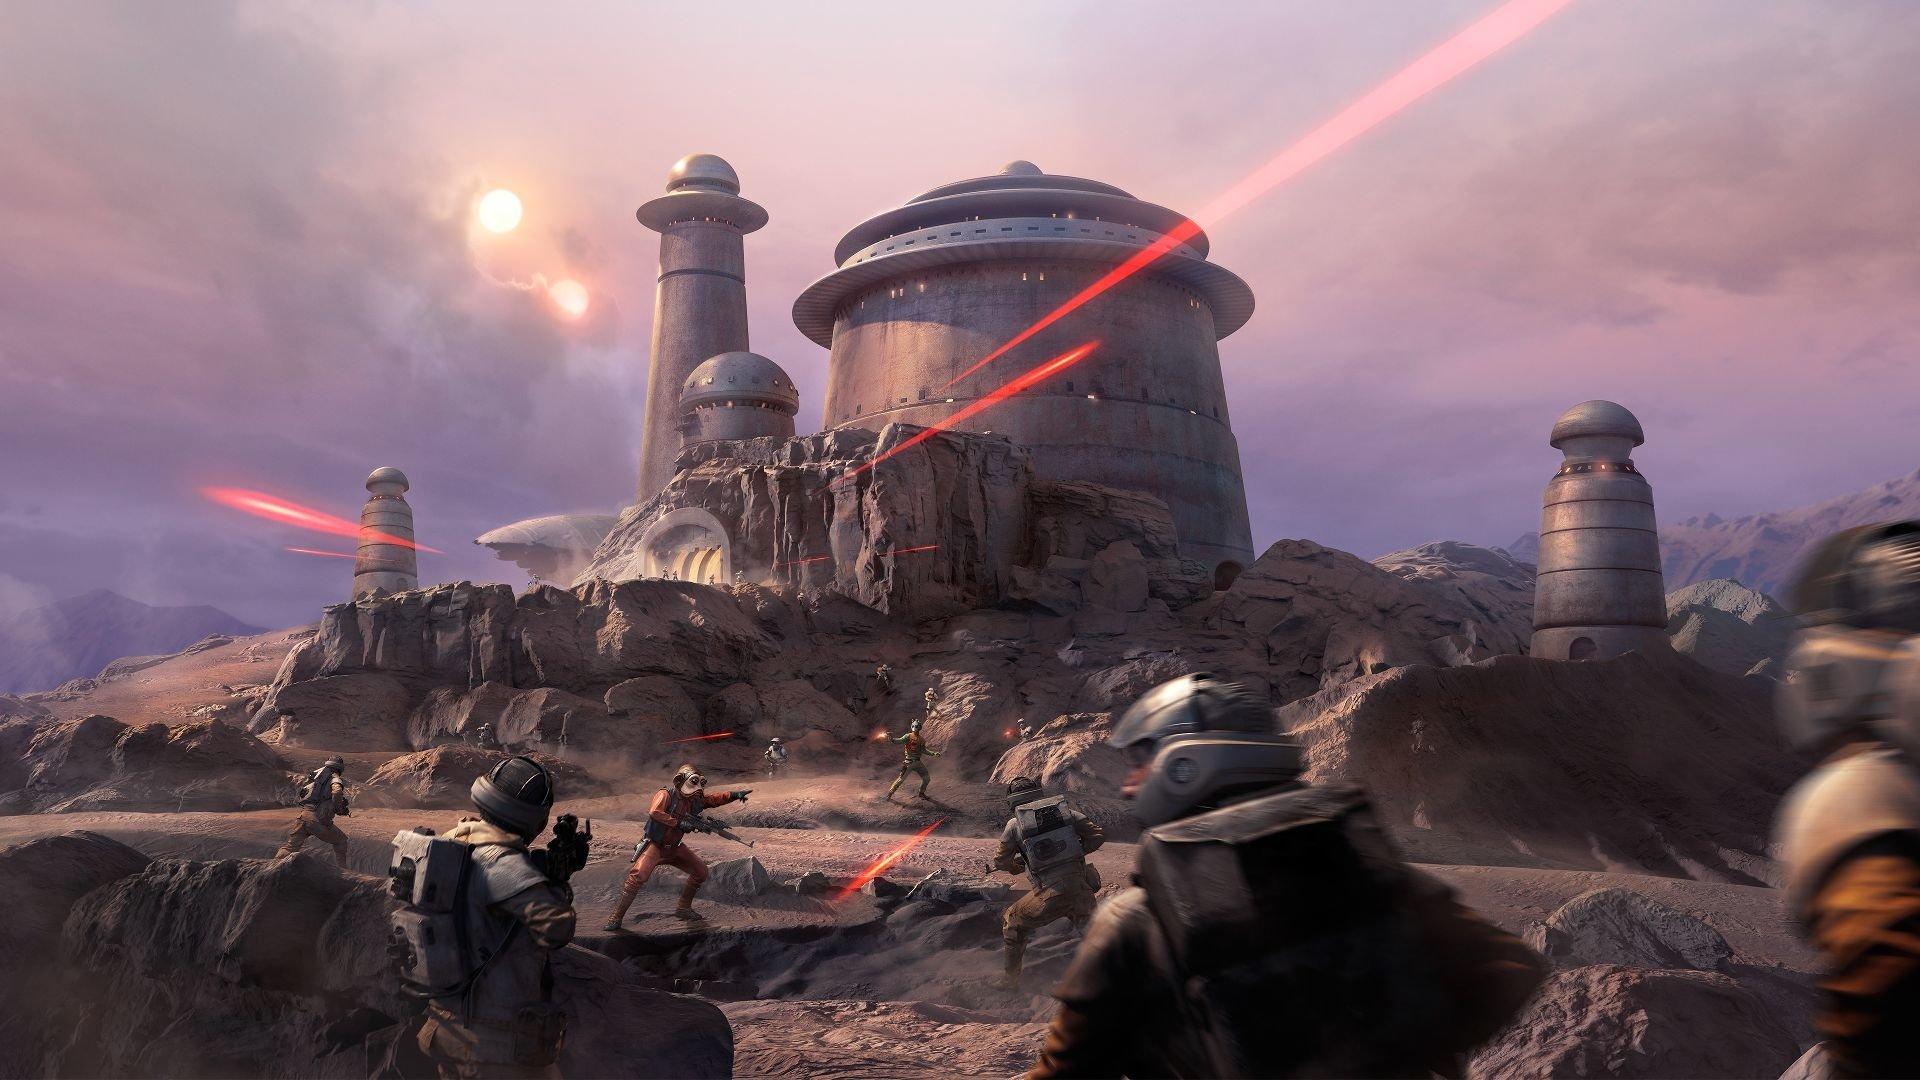 Video Game - Star Wars Battlefront (2015)  Star Wars Battlefront Rebel (Star Wars) Jabba's Palace Greedo (Star Wars) Nien Numb Wallpaper